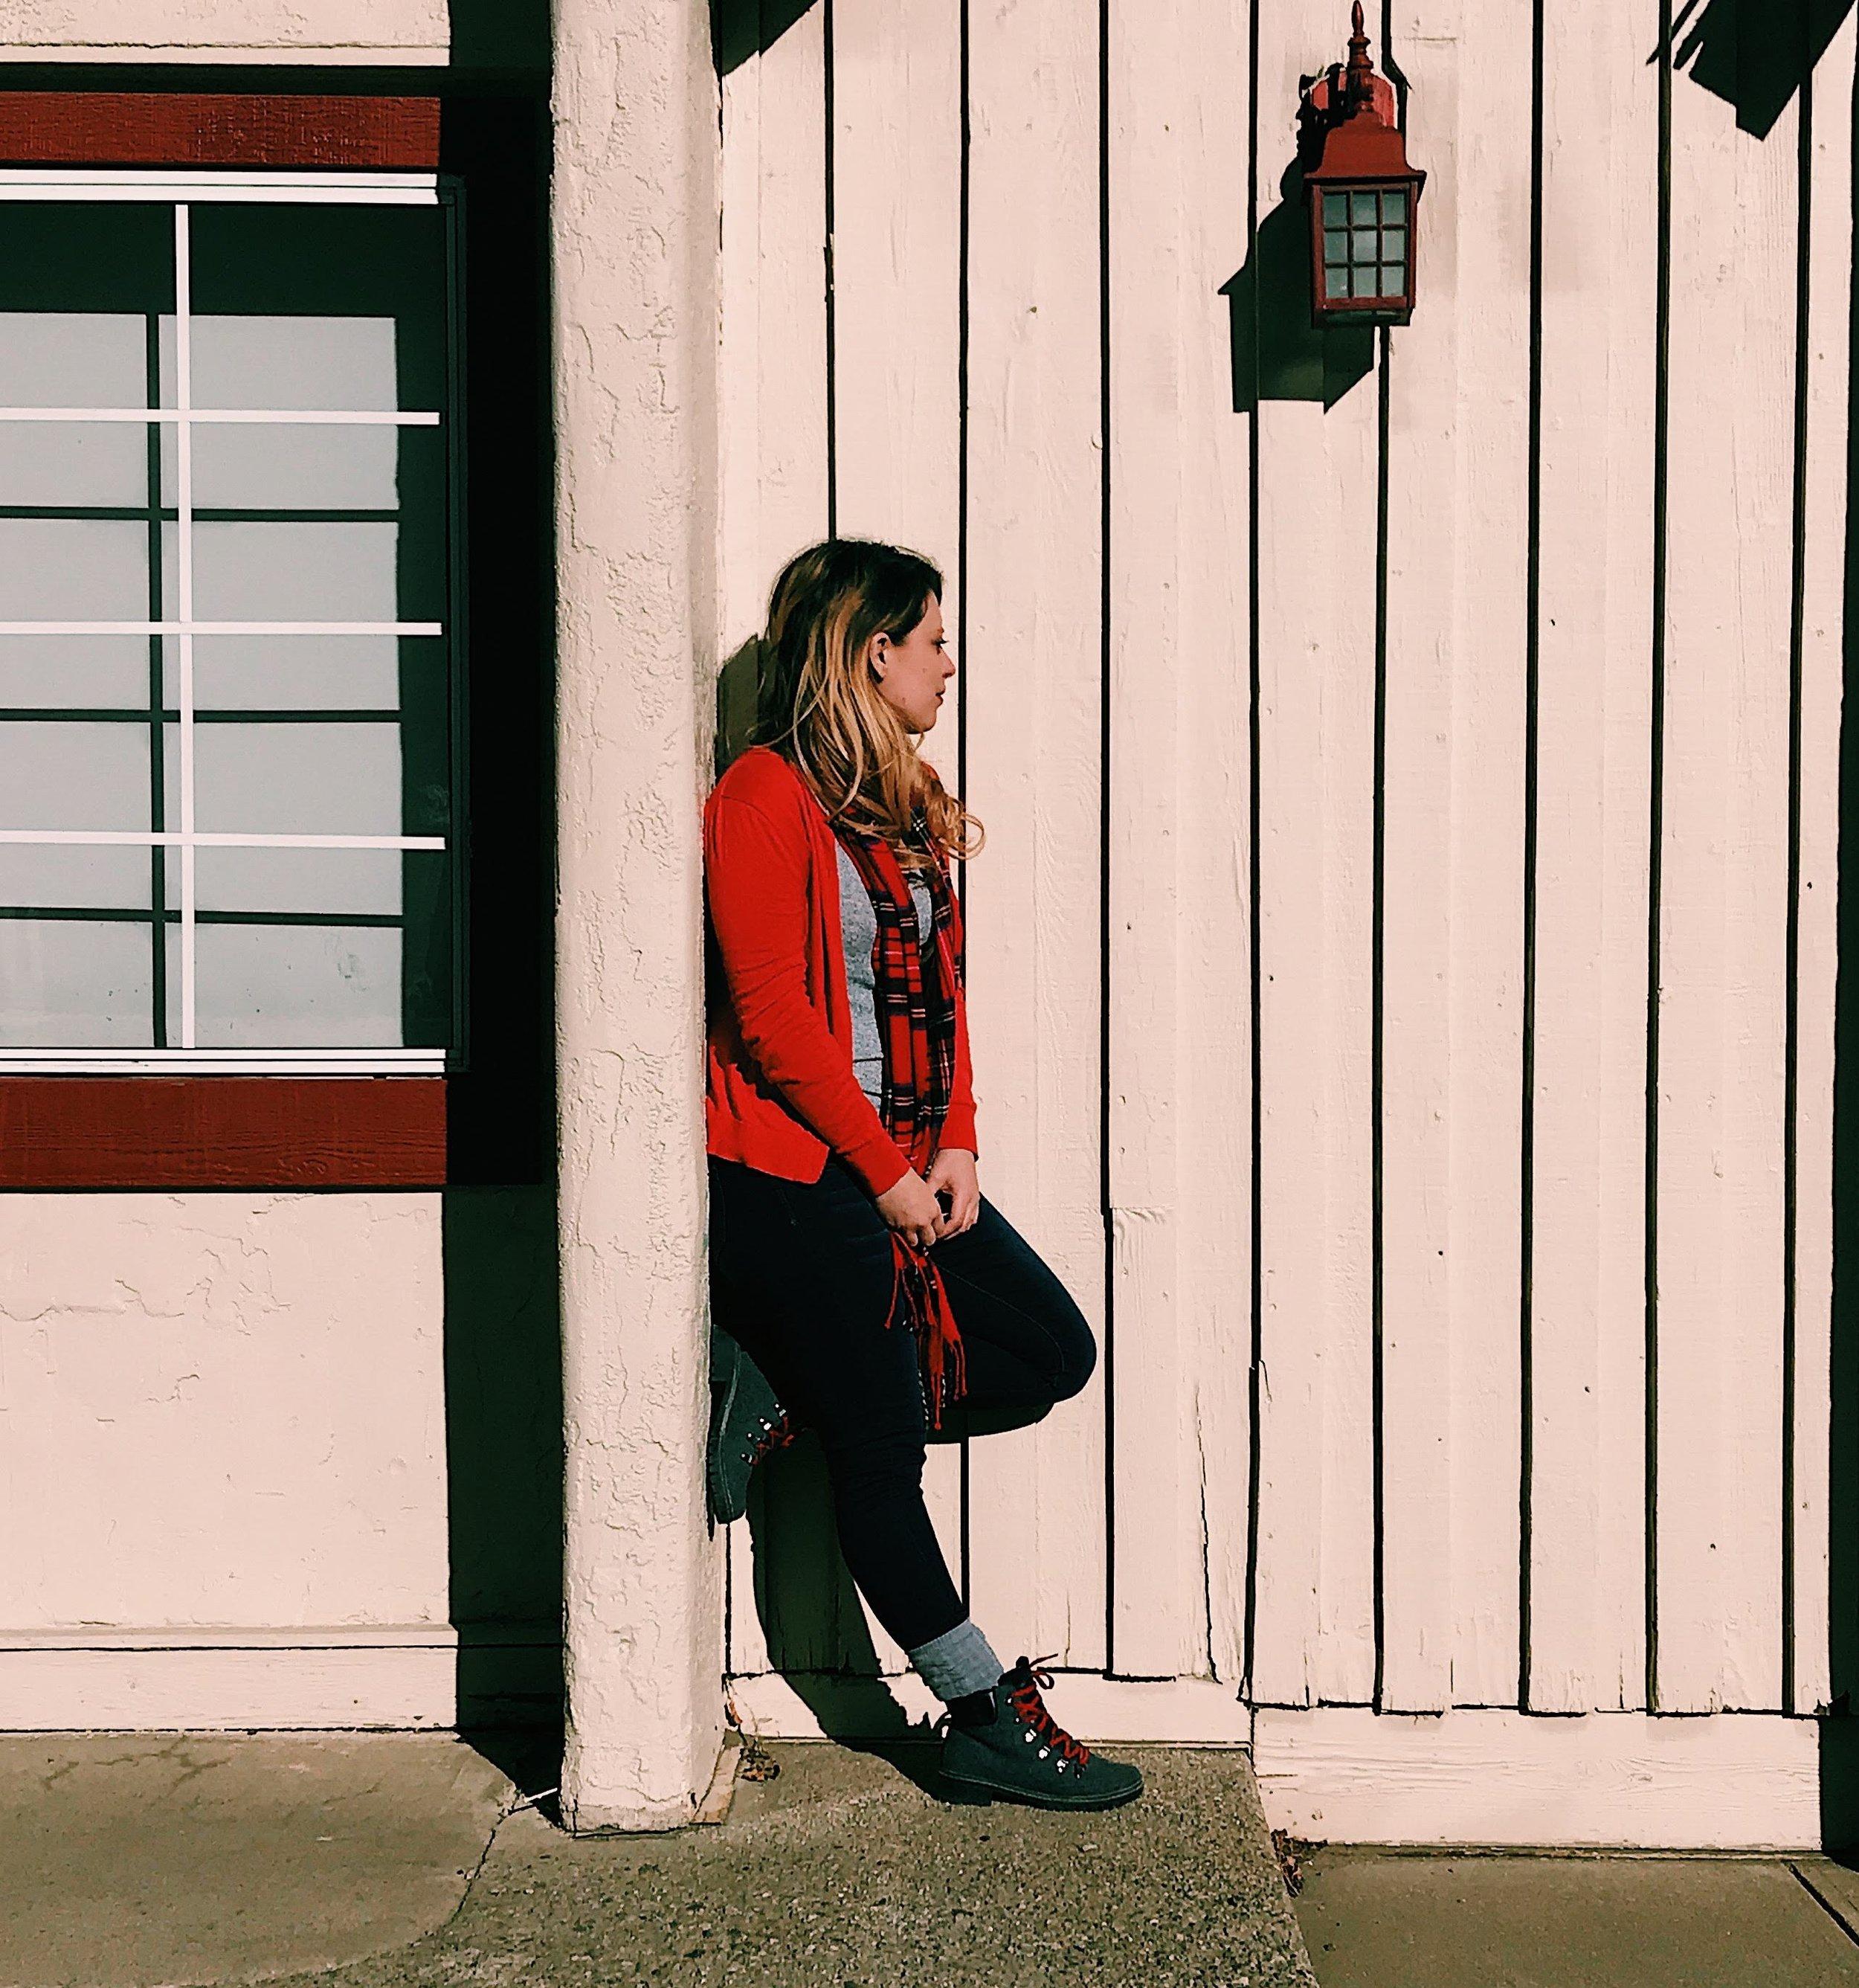 Three Heel Clicks - Small Town Charm - Idaho Springs - Colorado (23).jpg